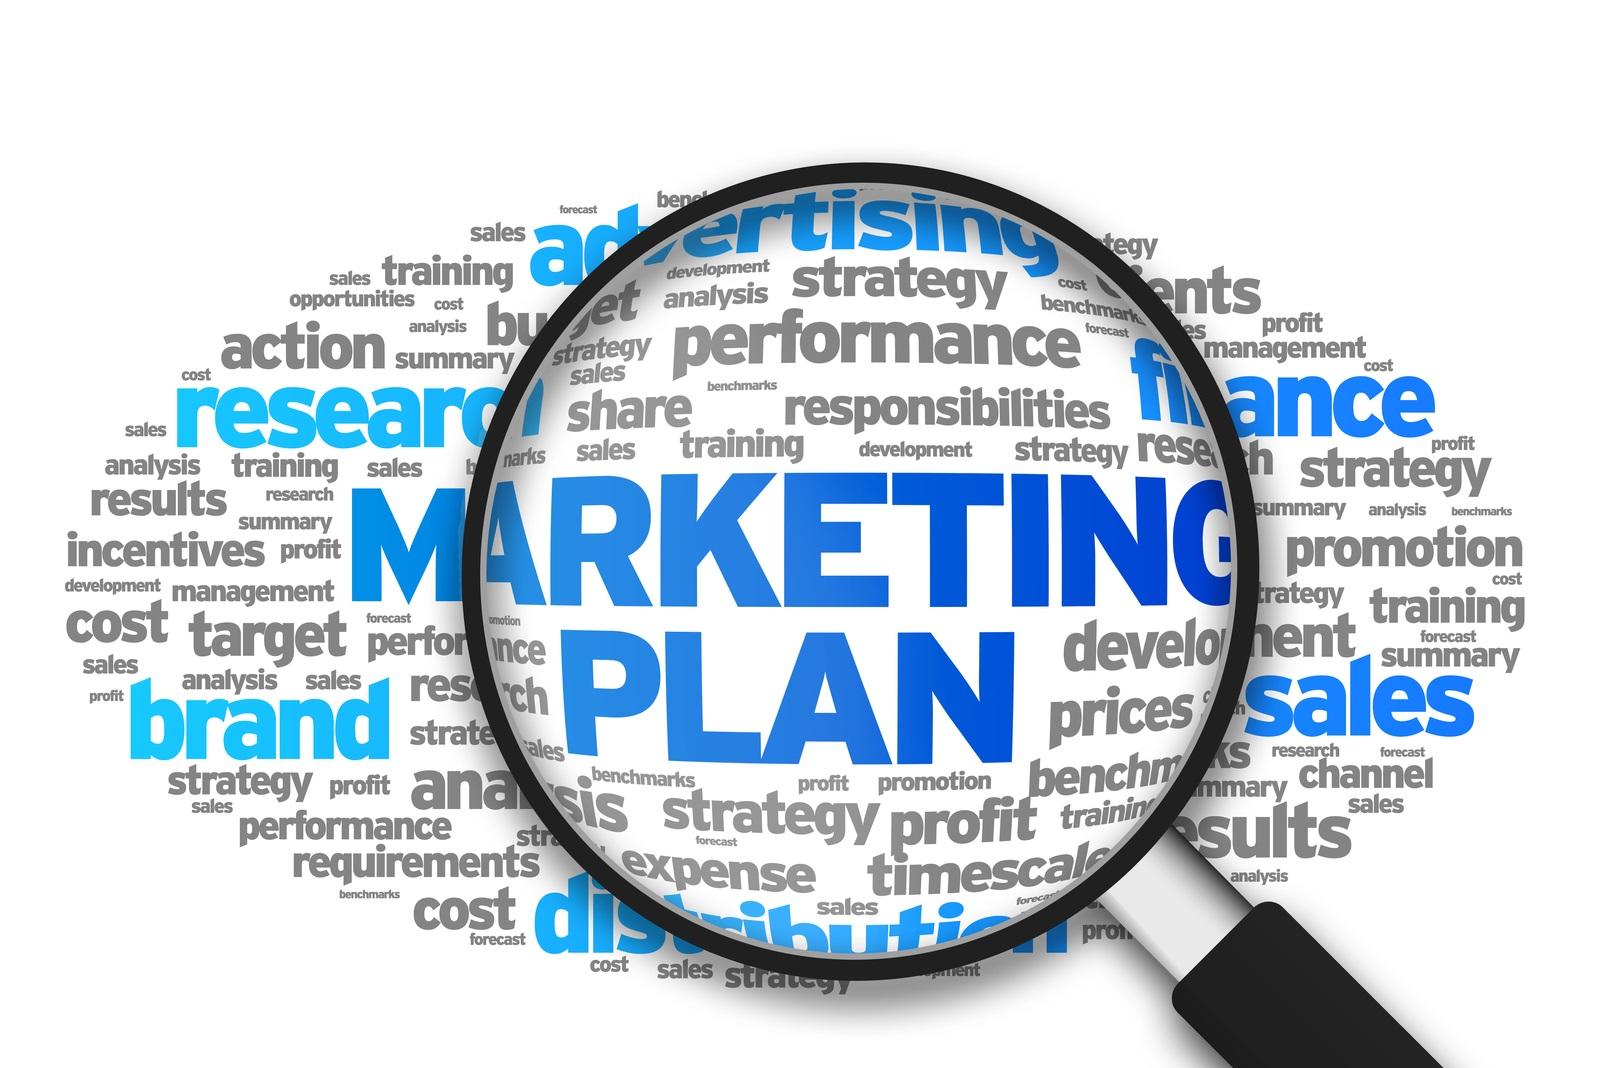 Strategic Marketing Planning: The key to marketing success